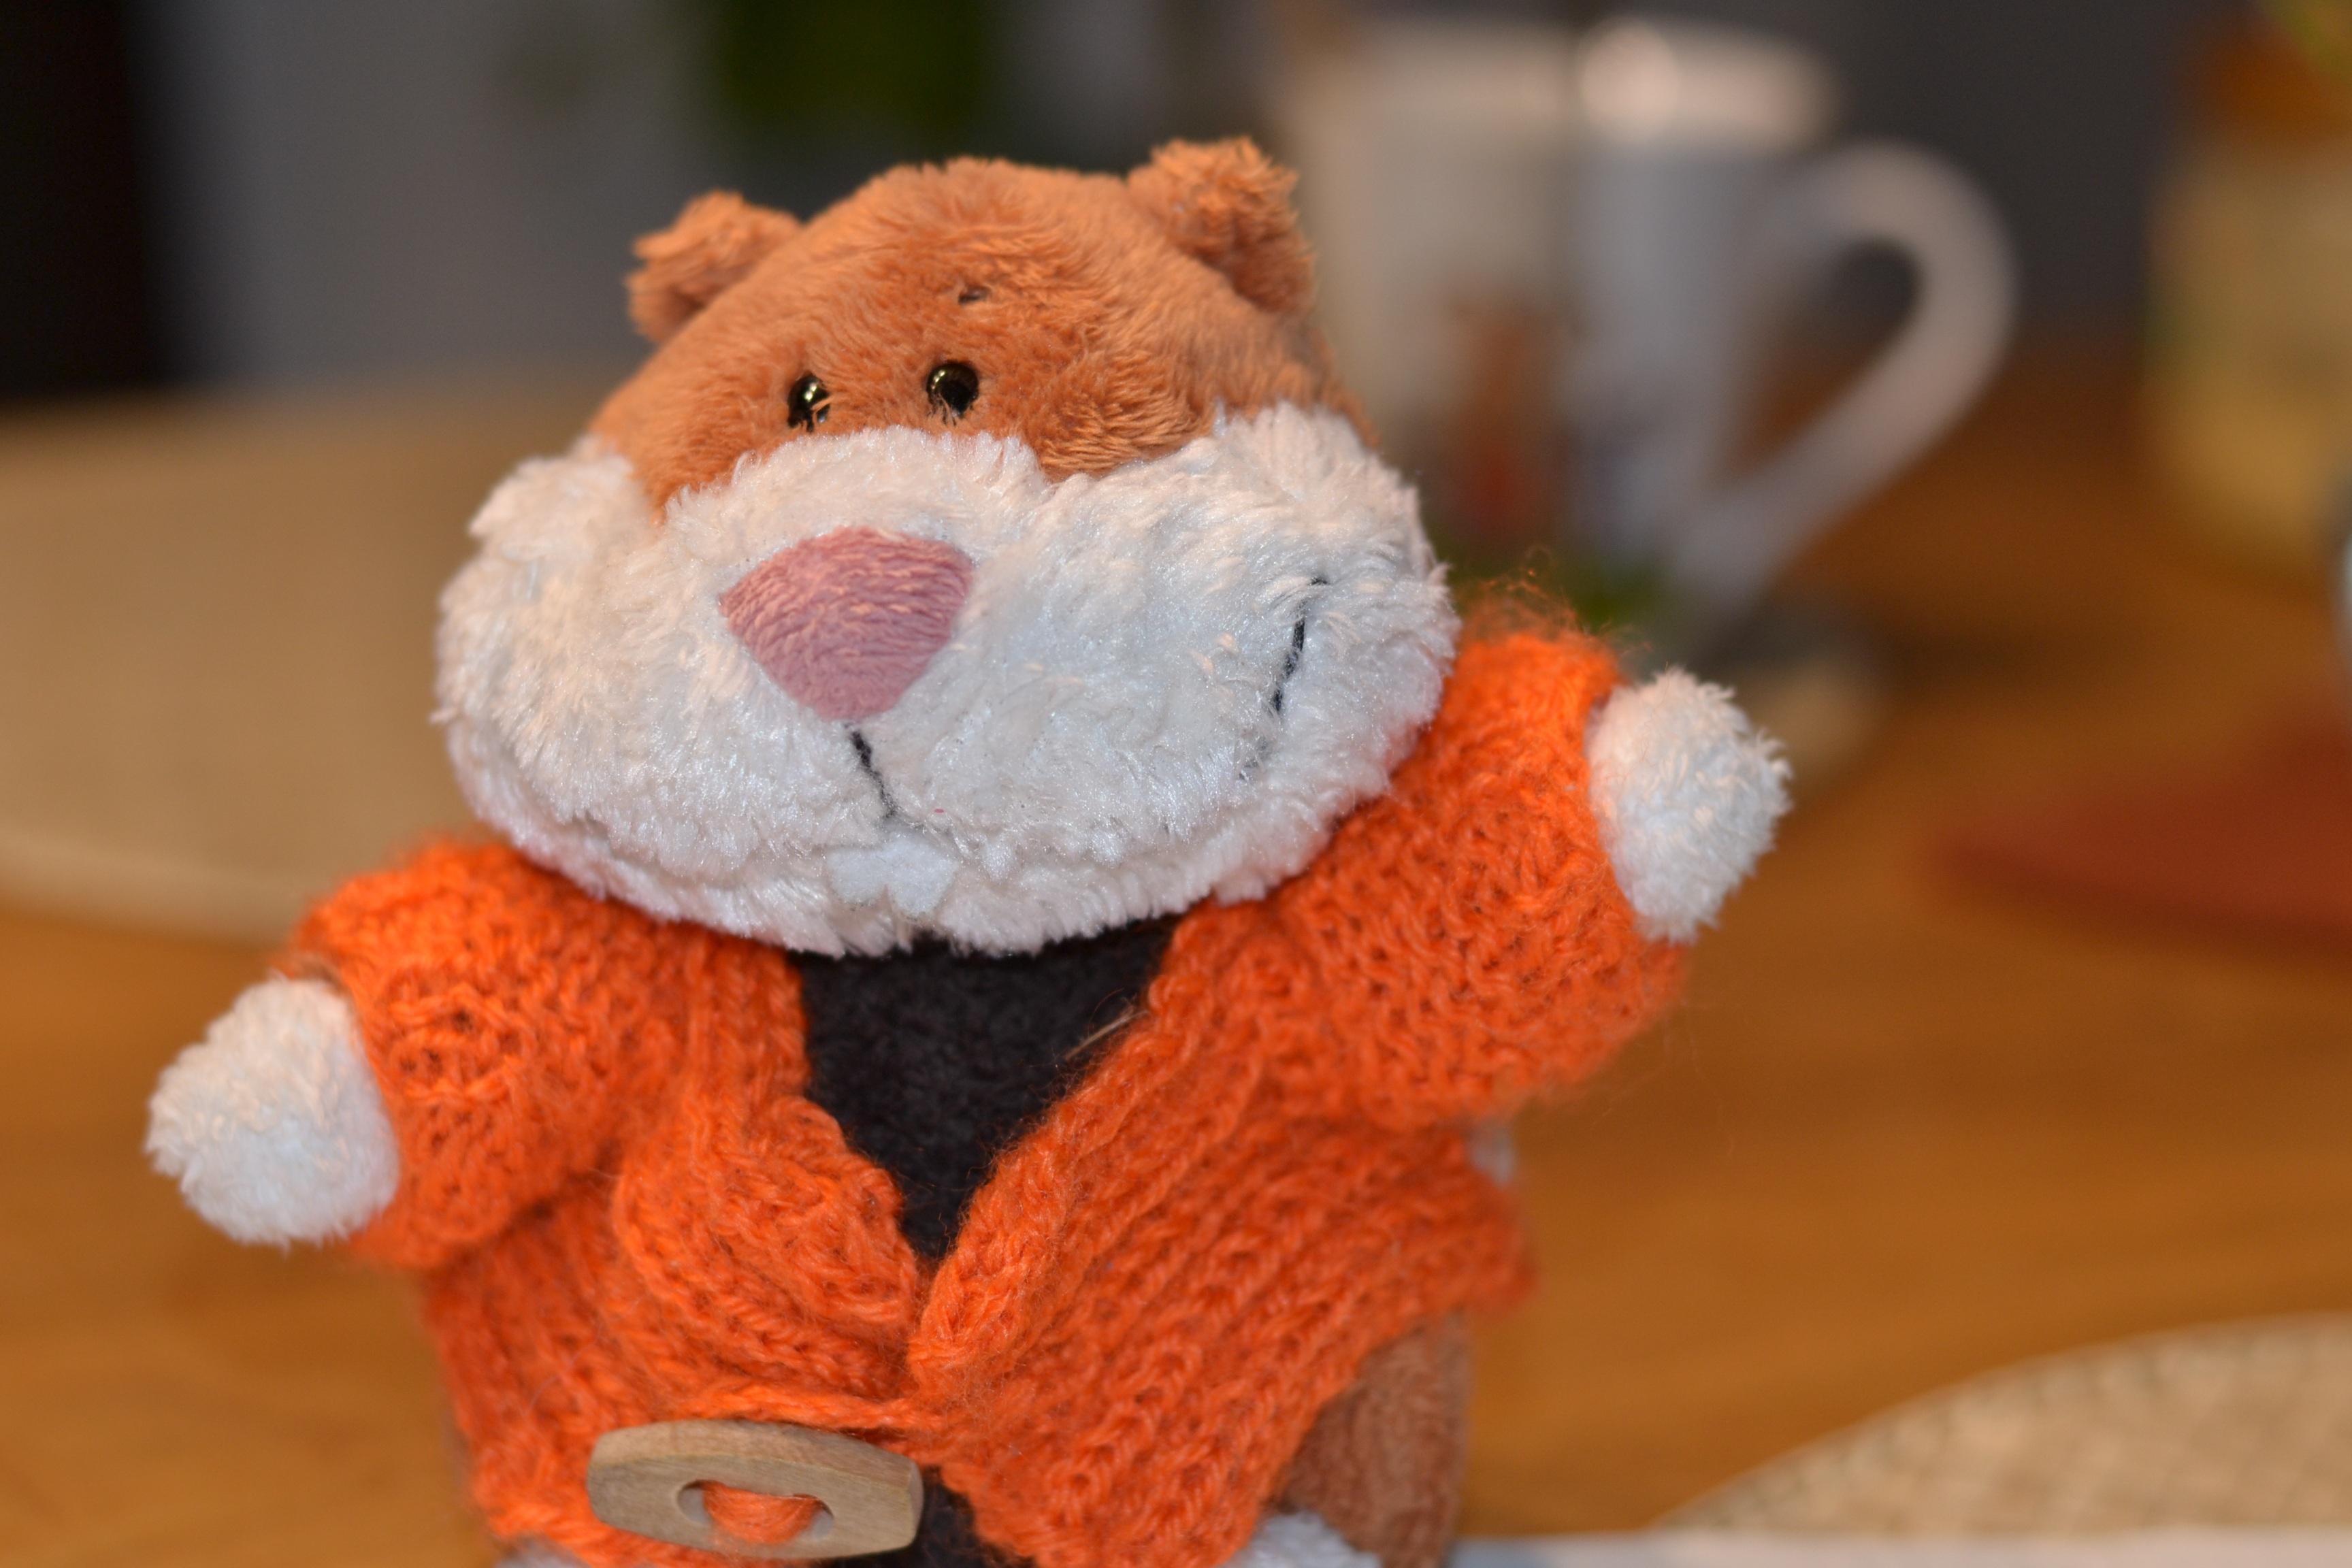 Kostenlose foto : Welle, Orange, Spielzeug, Hamster, Material ...